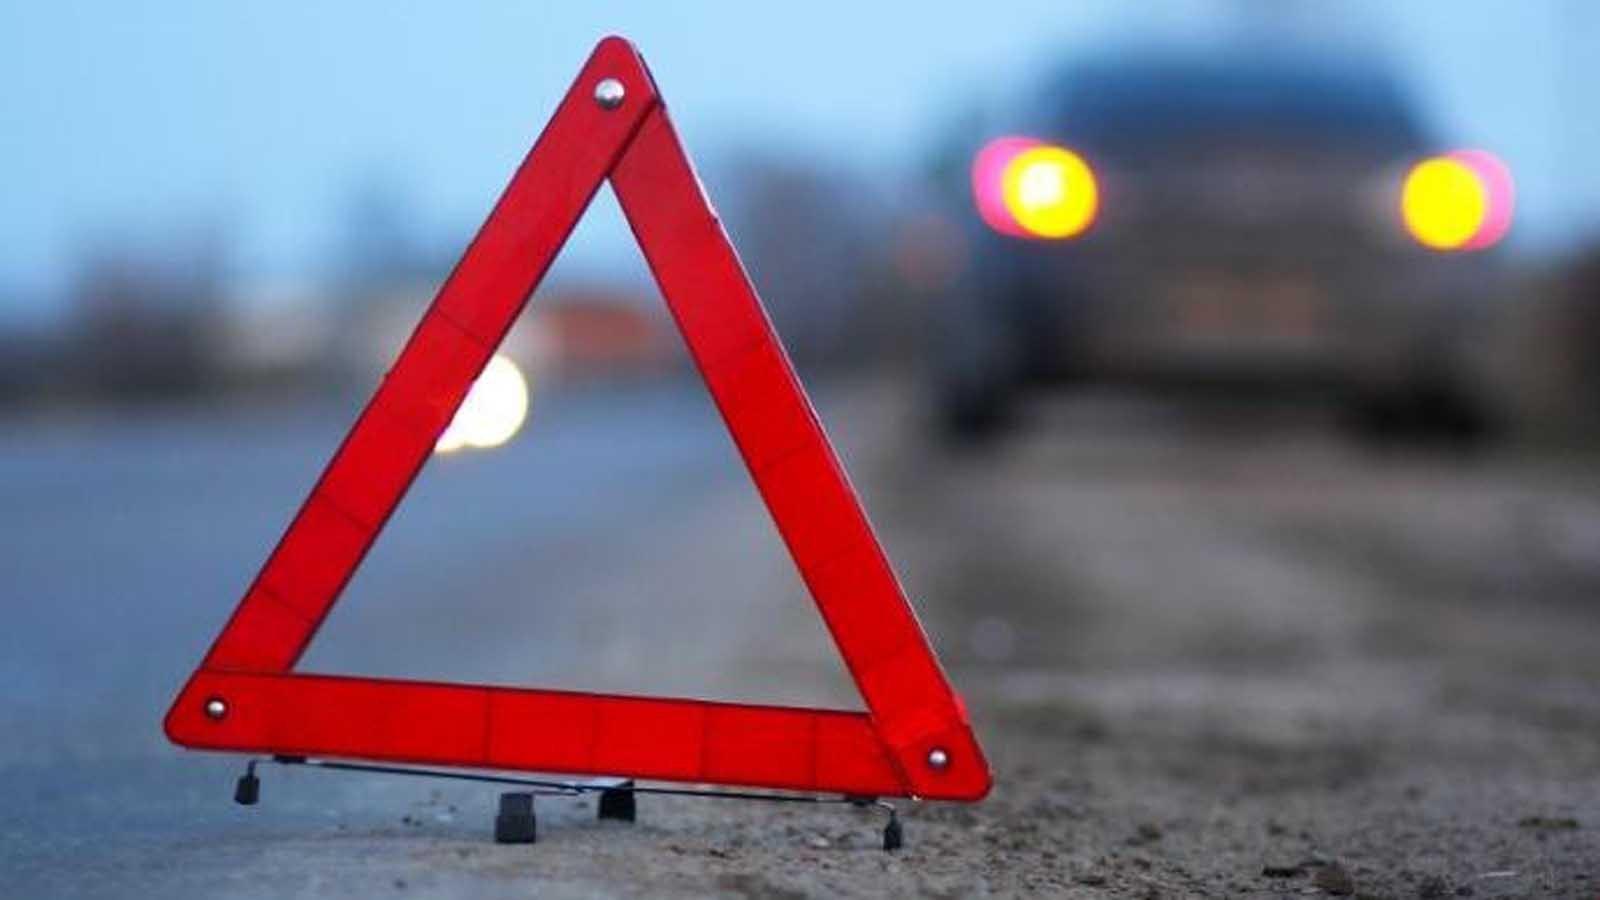 Втройном ДТП под Воронежем пострадал шофёр и7-летний ребенок